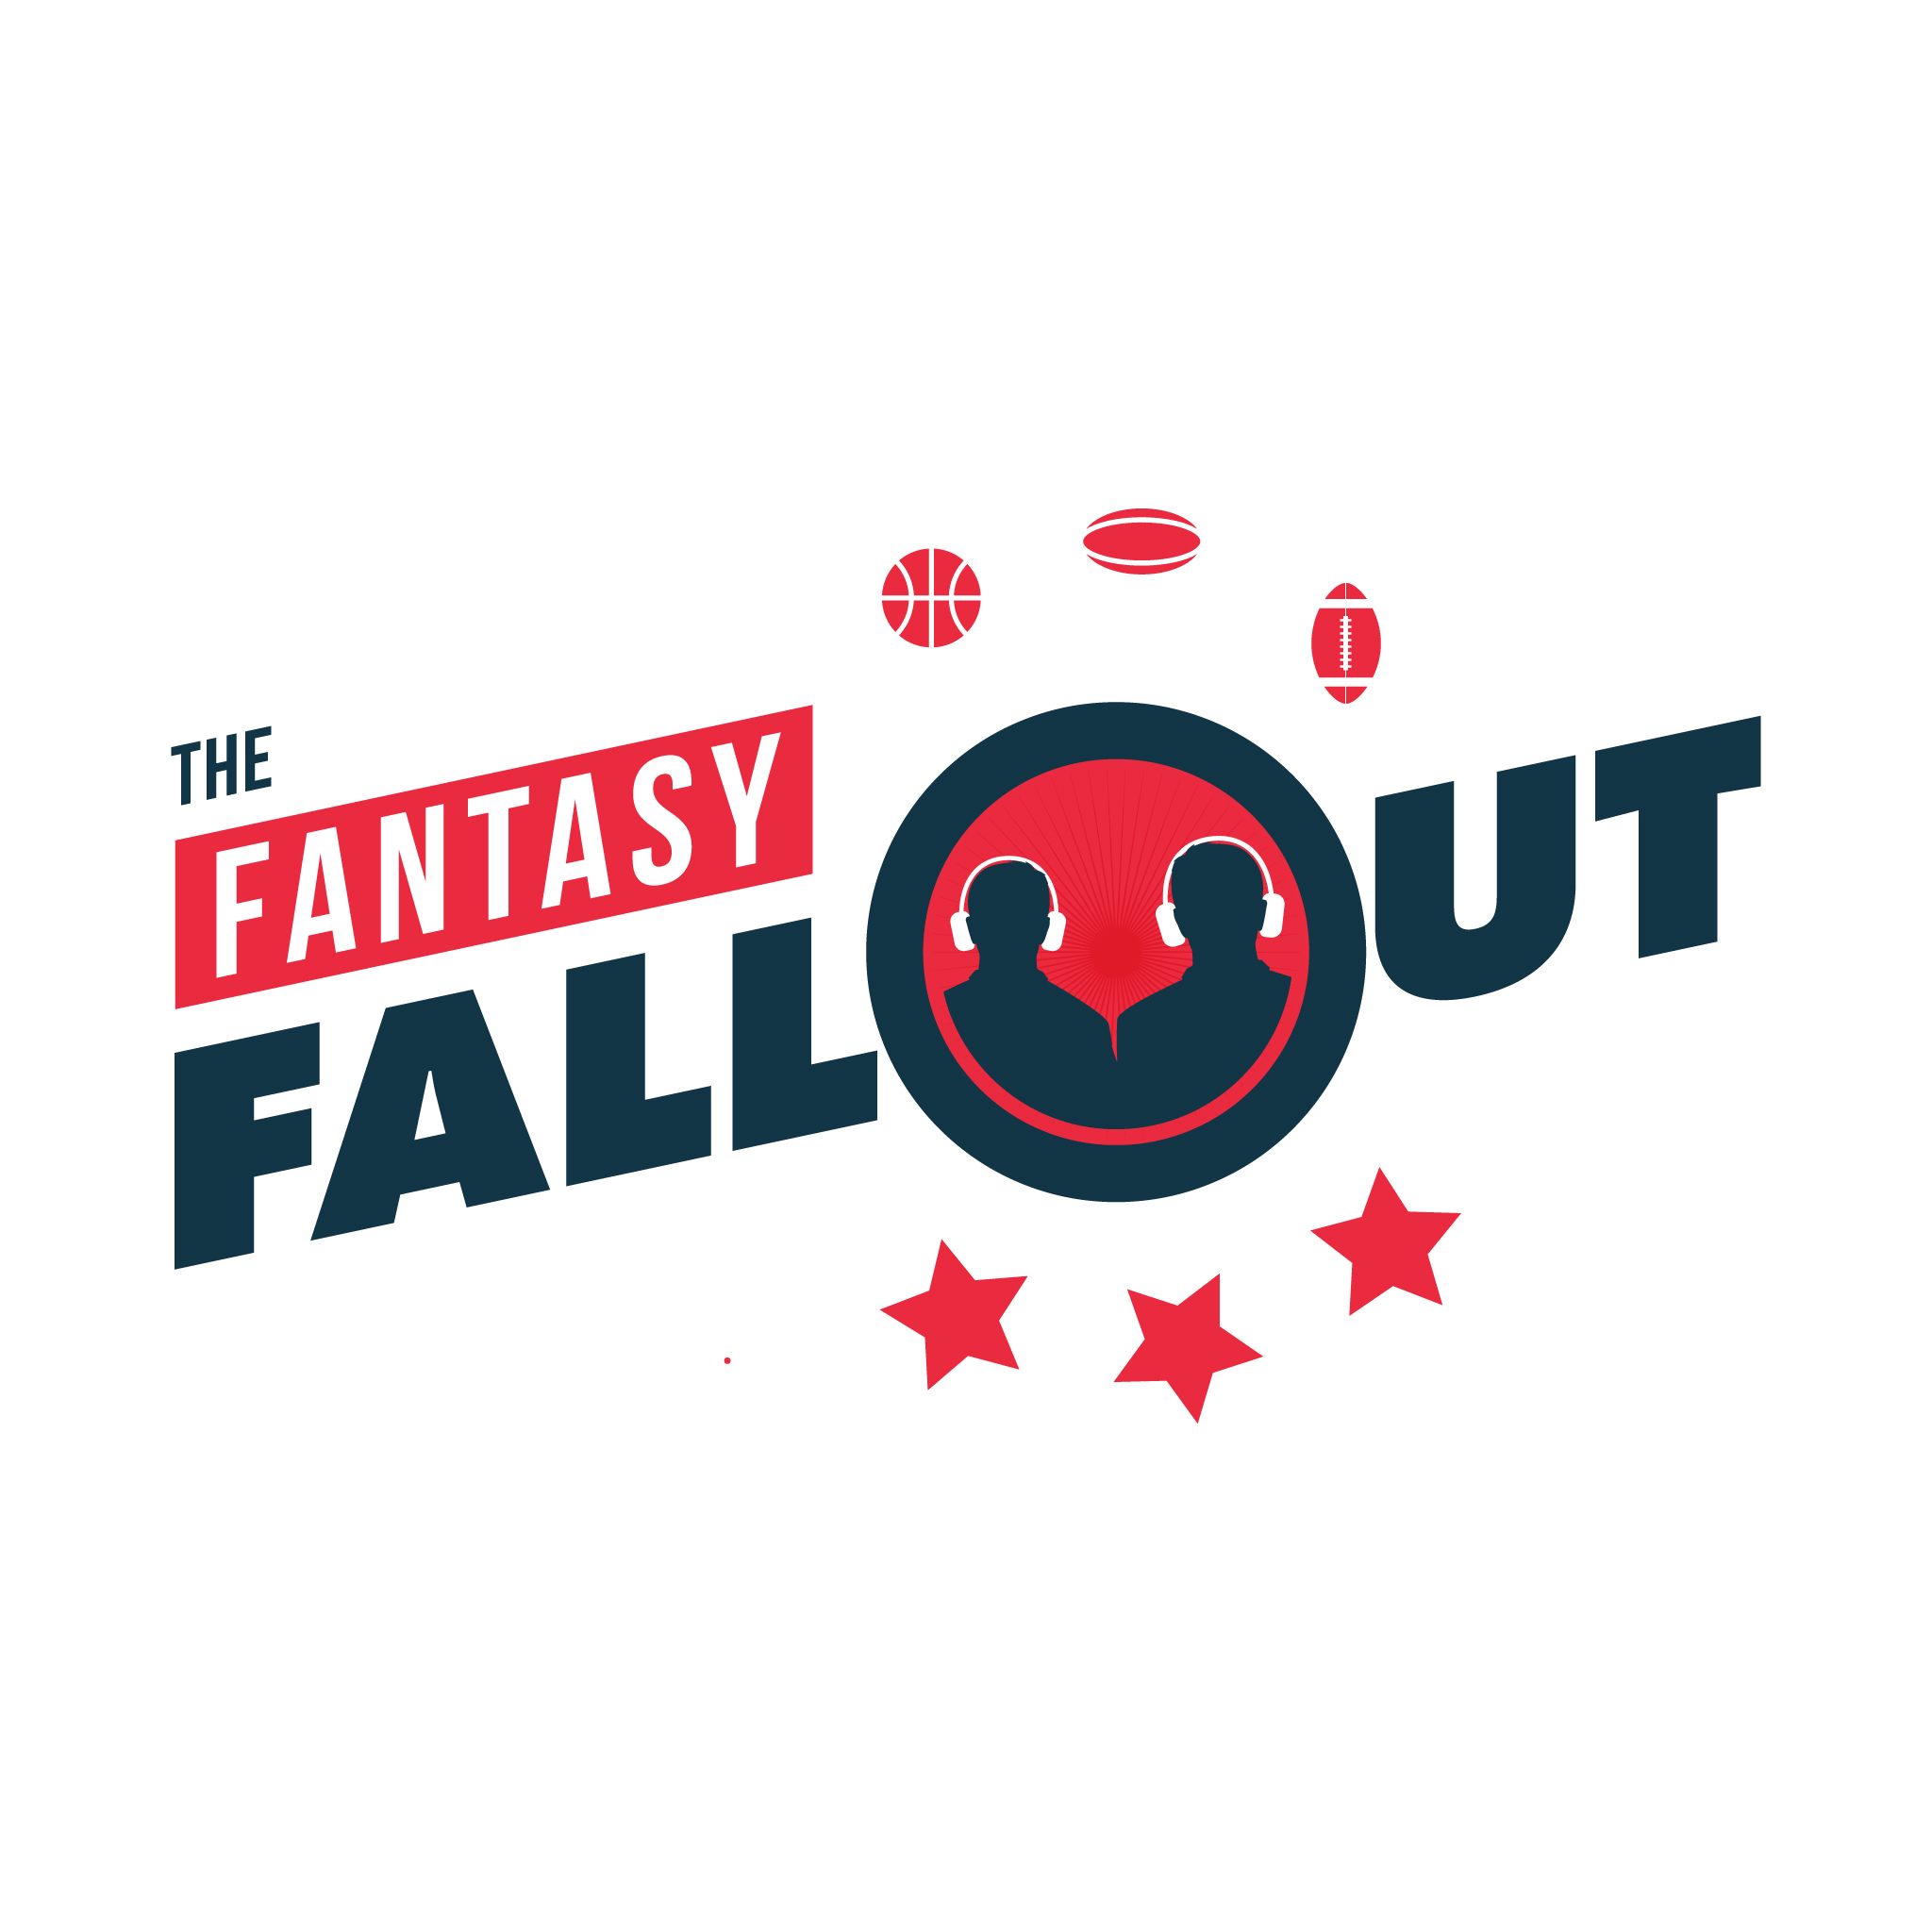 The Fantasy Fallout